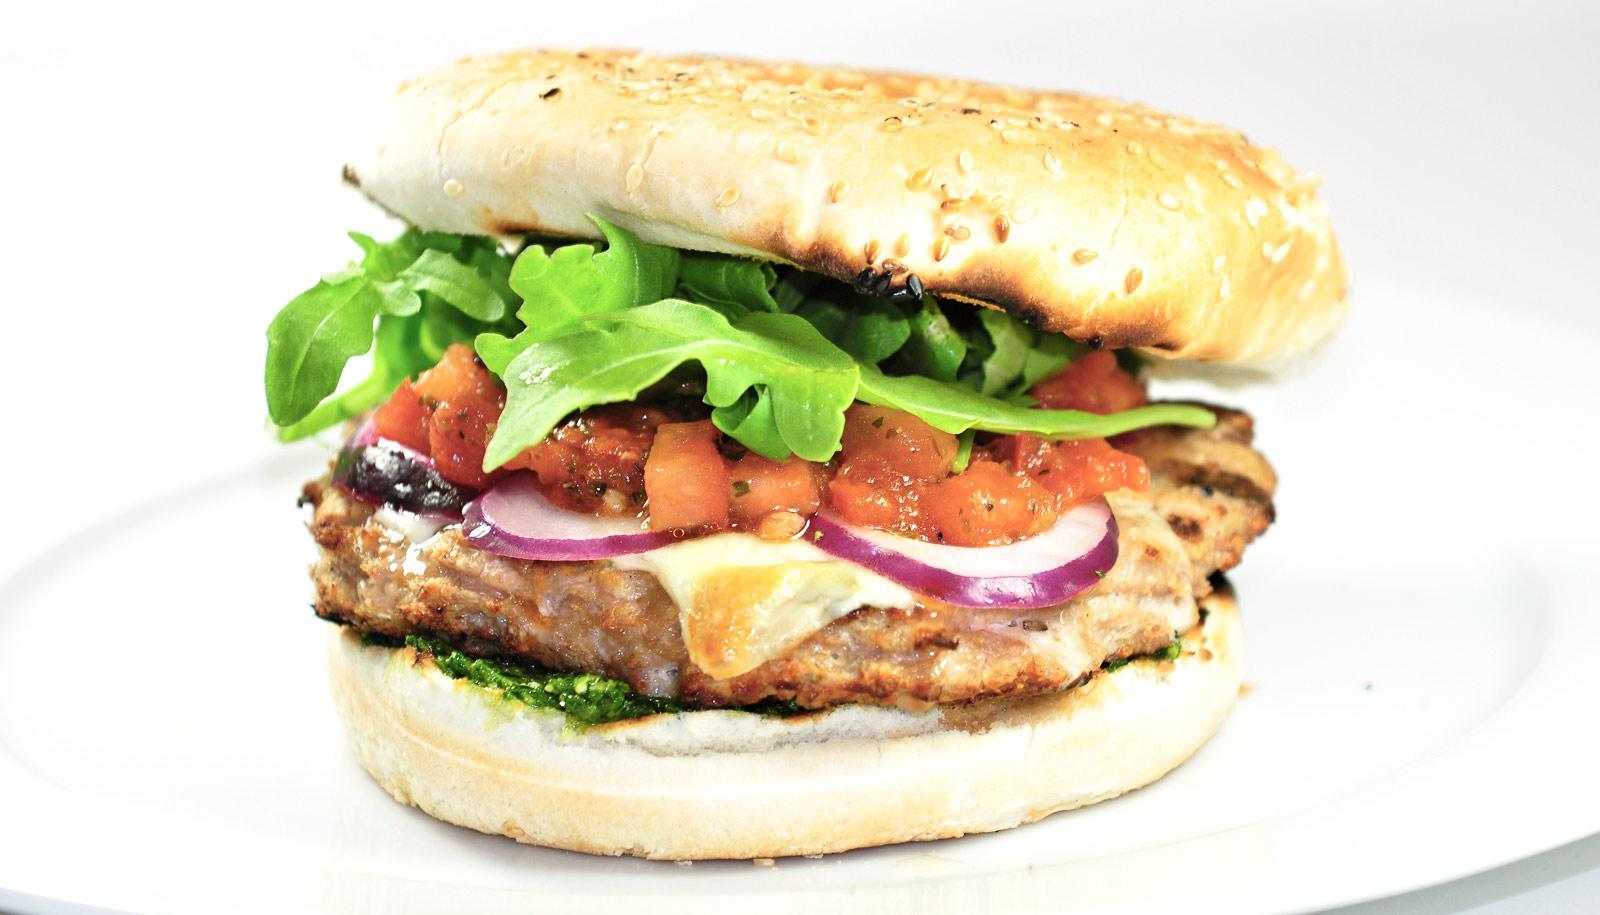 turkey burger - carbon footprint